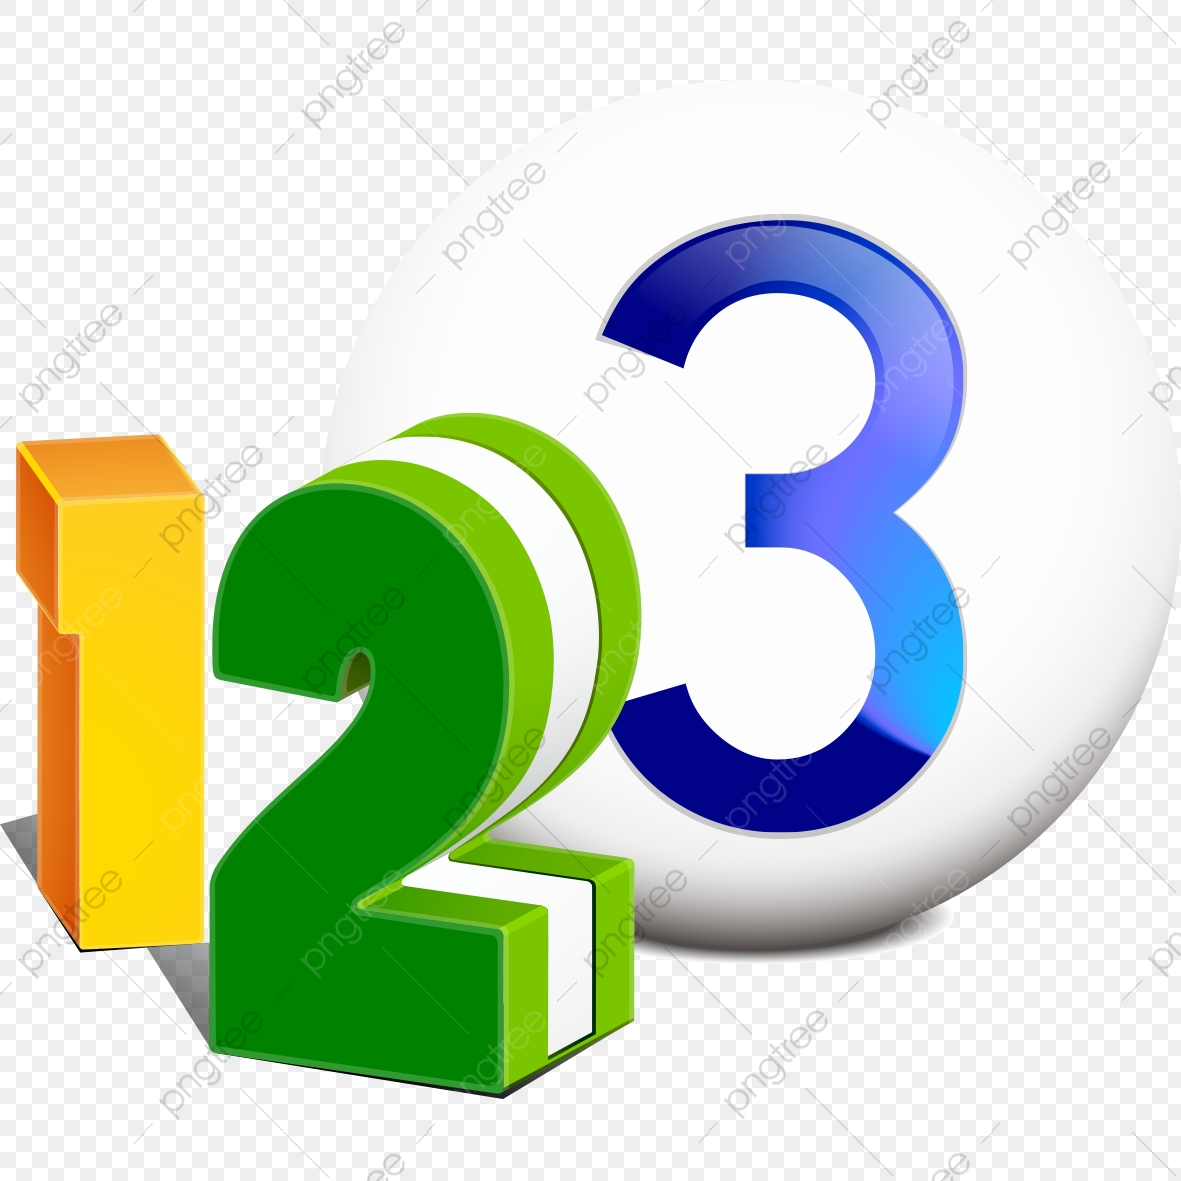 123 Wordart, Art, Art Font, Wordart PNG Transparent Image and.